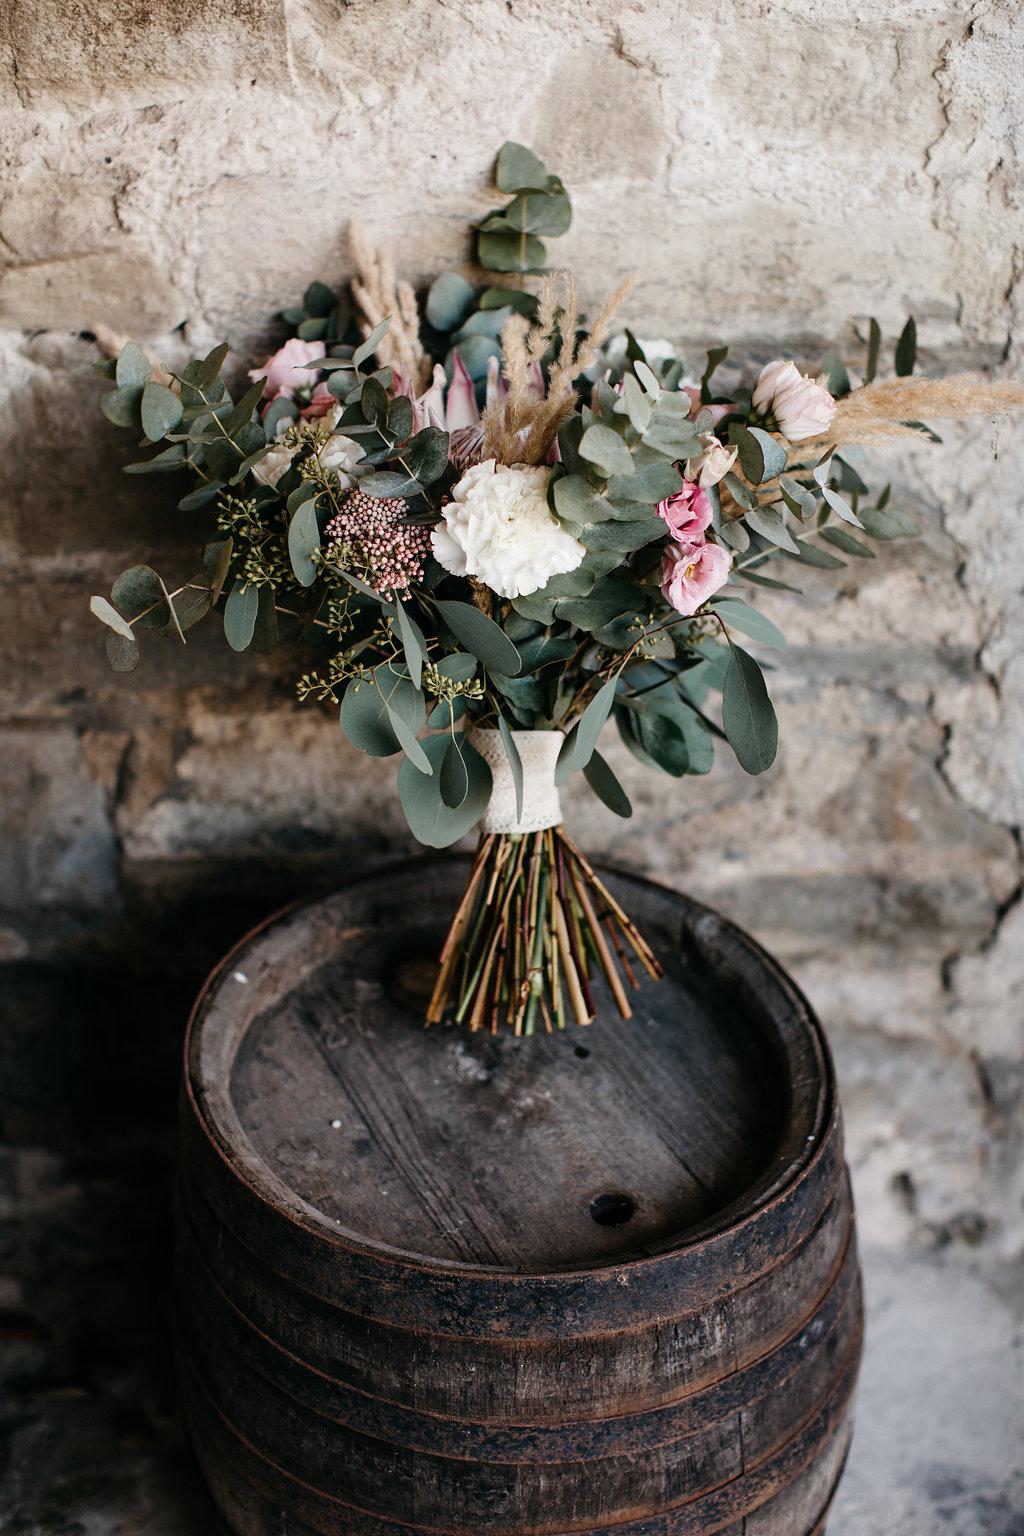 Brautstrauß Boho, Brautstrauß Protea, Brautstrauß Eukalyptus, Brautstrauß Boho Hochzeit